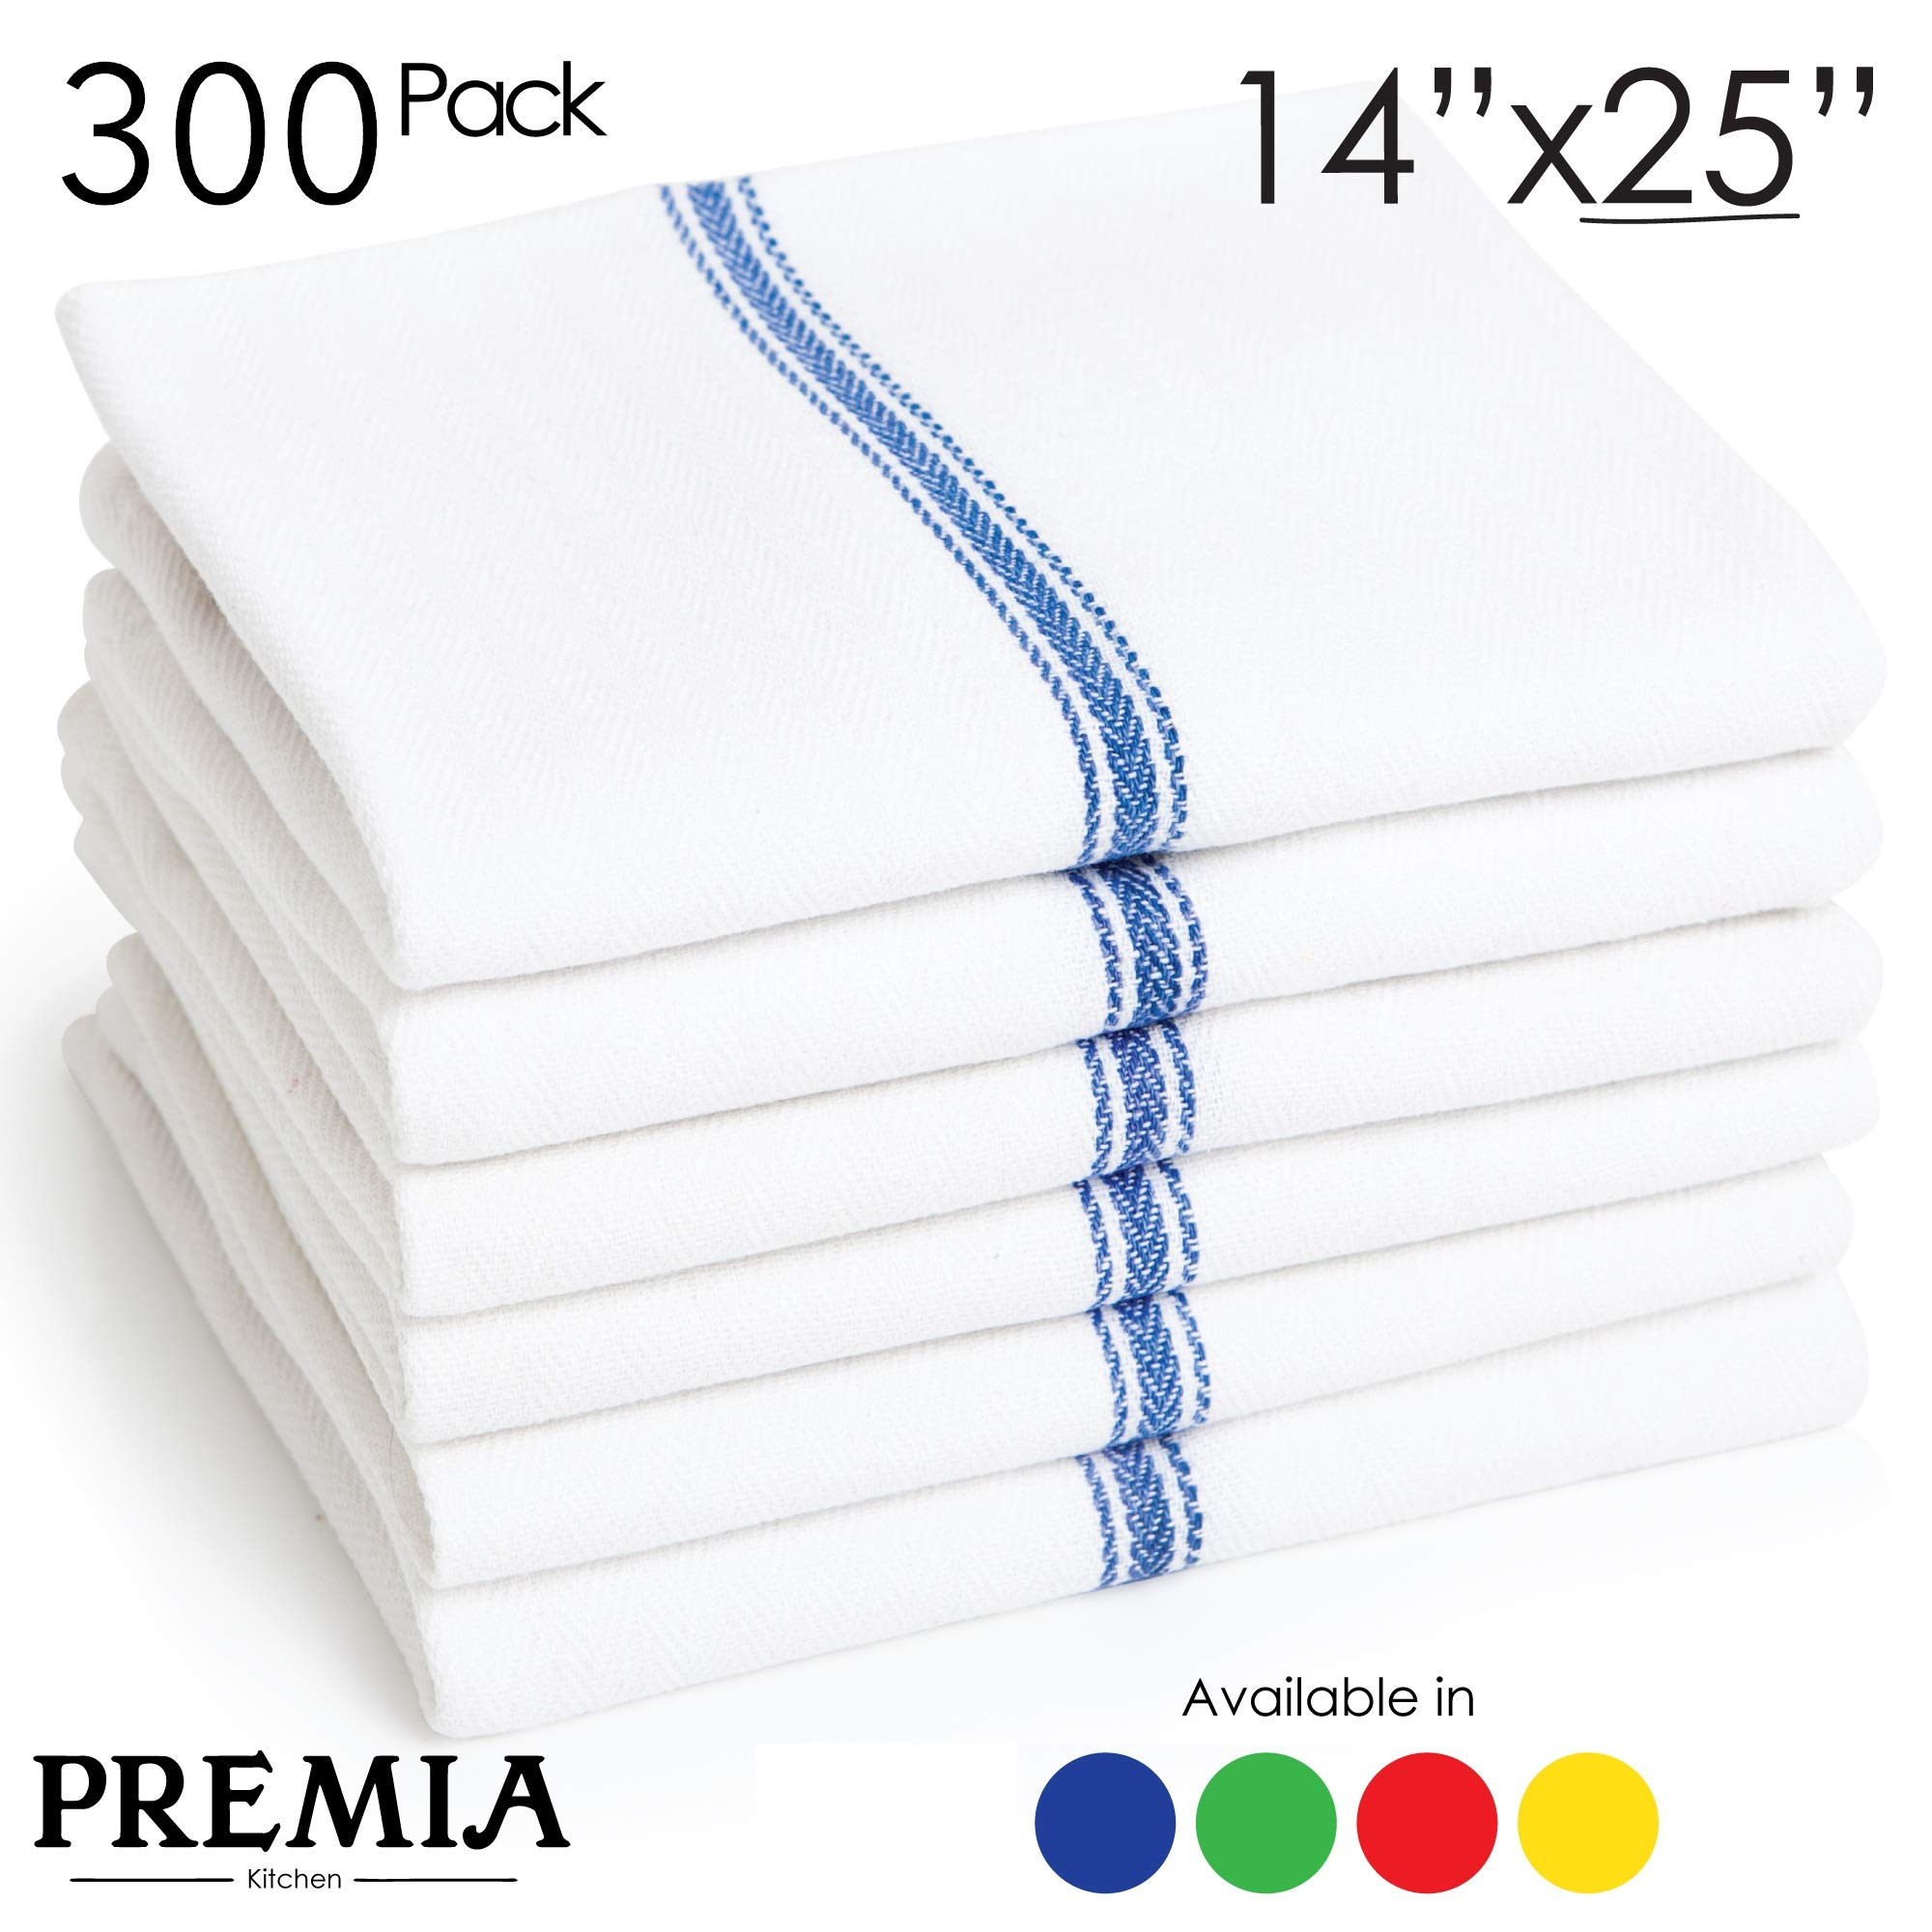 Bulk Economy Wholesale Kitchen Dish Towels (300 Towels) - 100% Cotton Herringbone - Commercial Grade - Bleach Resistant - Restaurant Bar Mops - 24 oz/dz - White with Blue Stripes by Premia Kitchen